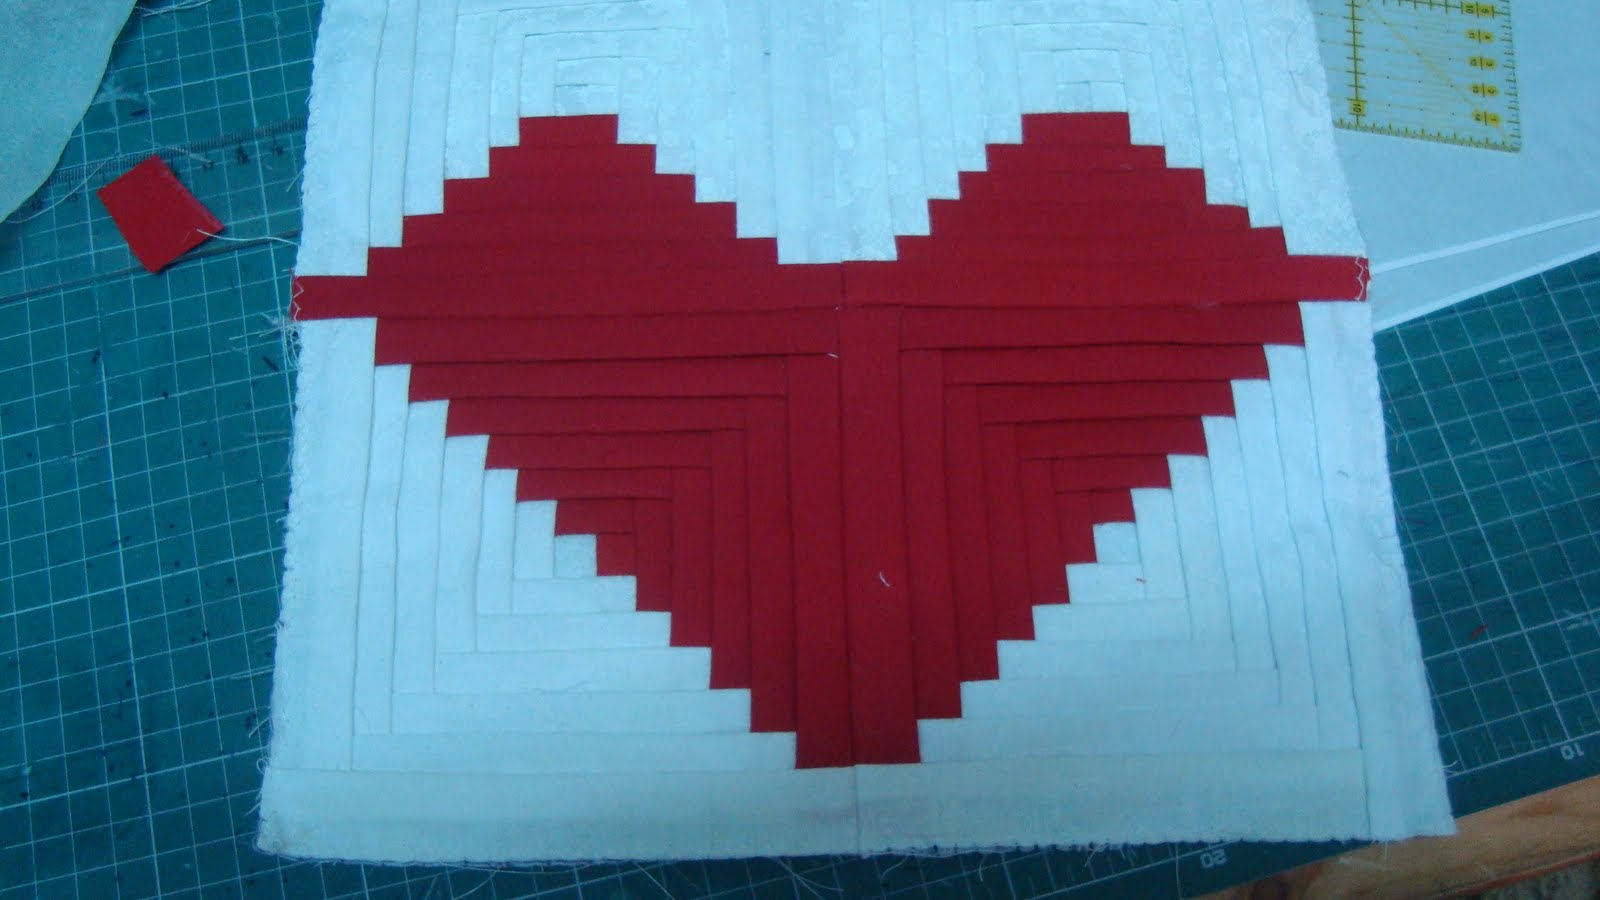 Lios de ana almazuelas - Almazuelas patrones gratis ...